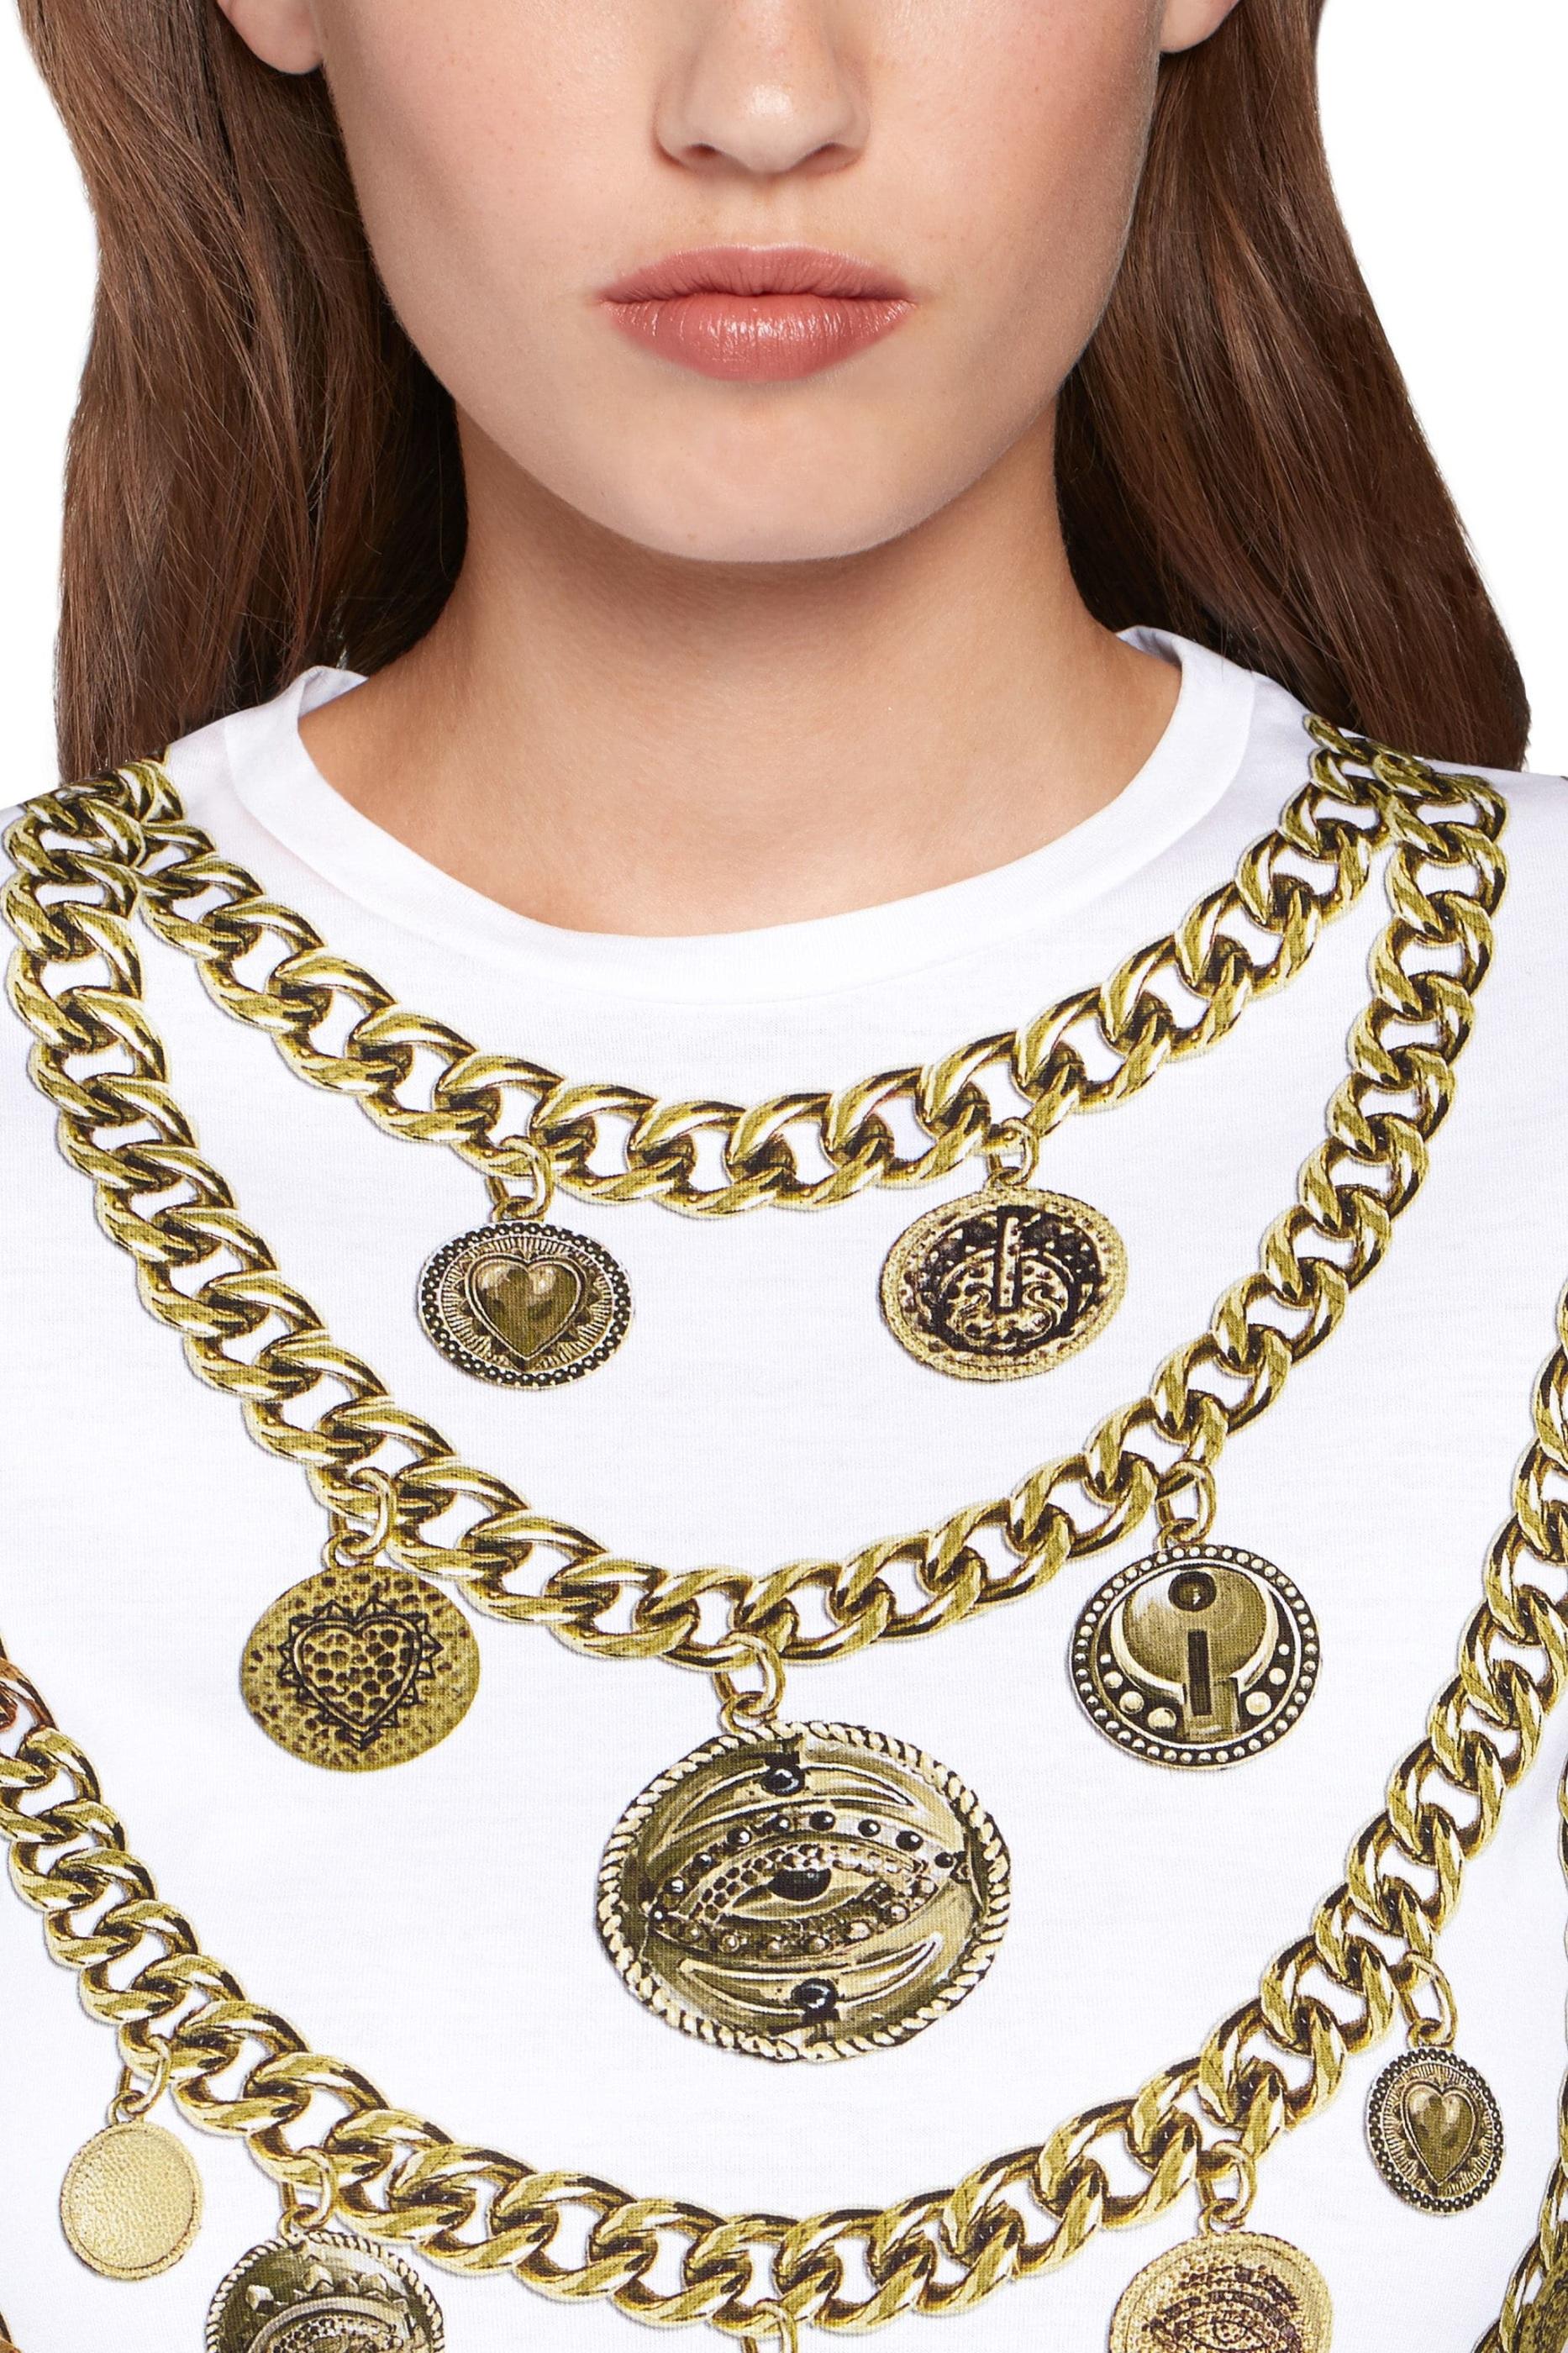 roberto-cavalli-medallion-print-t-shirt_13150805_15612857_2048